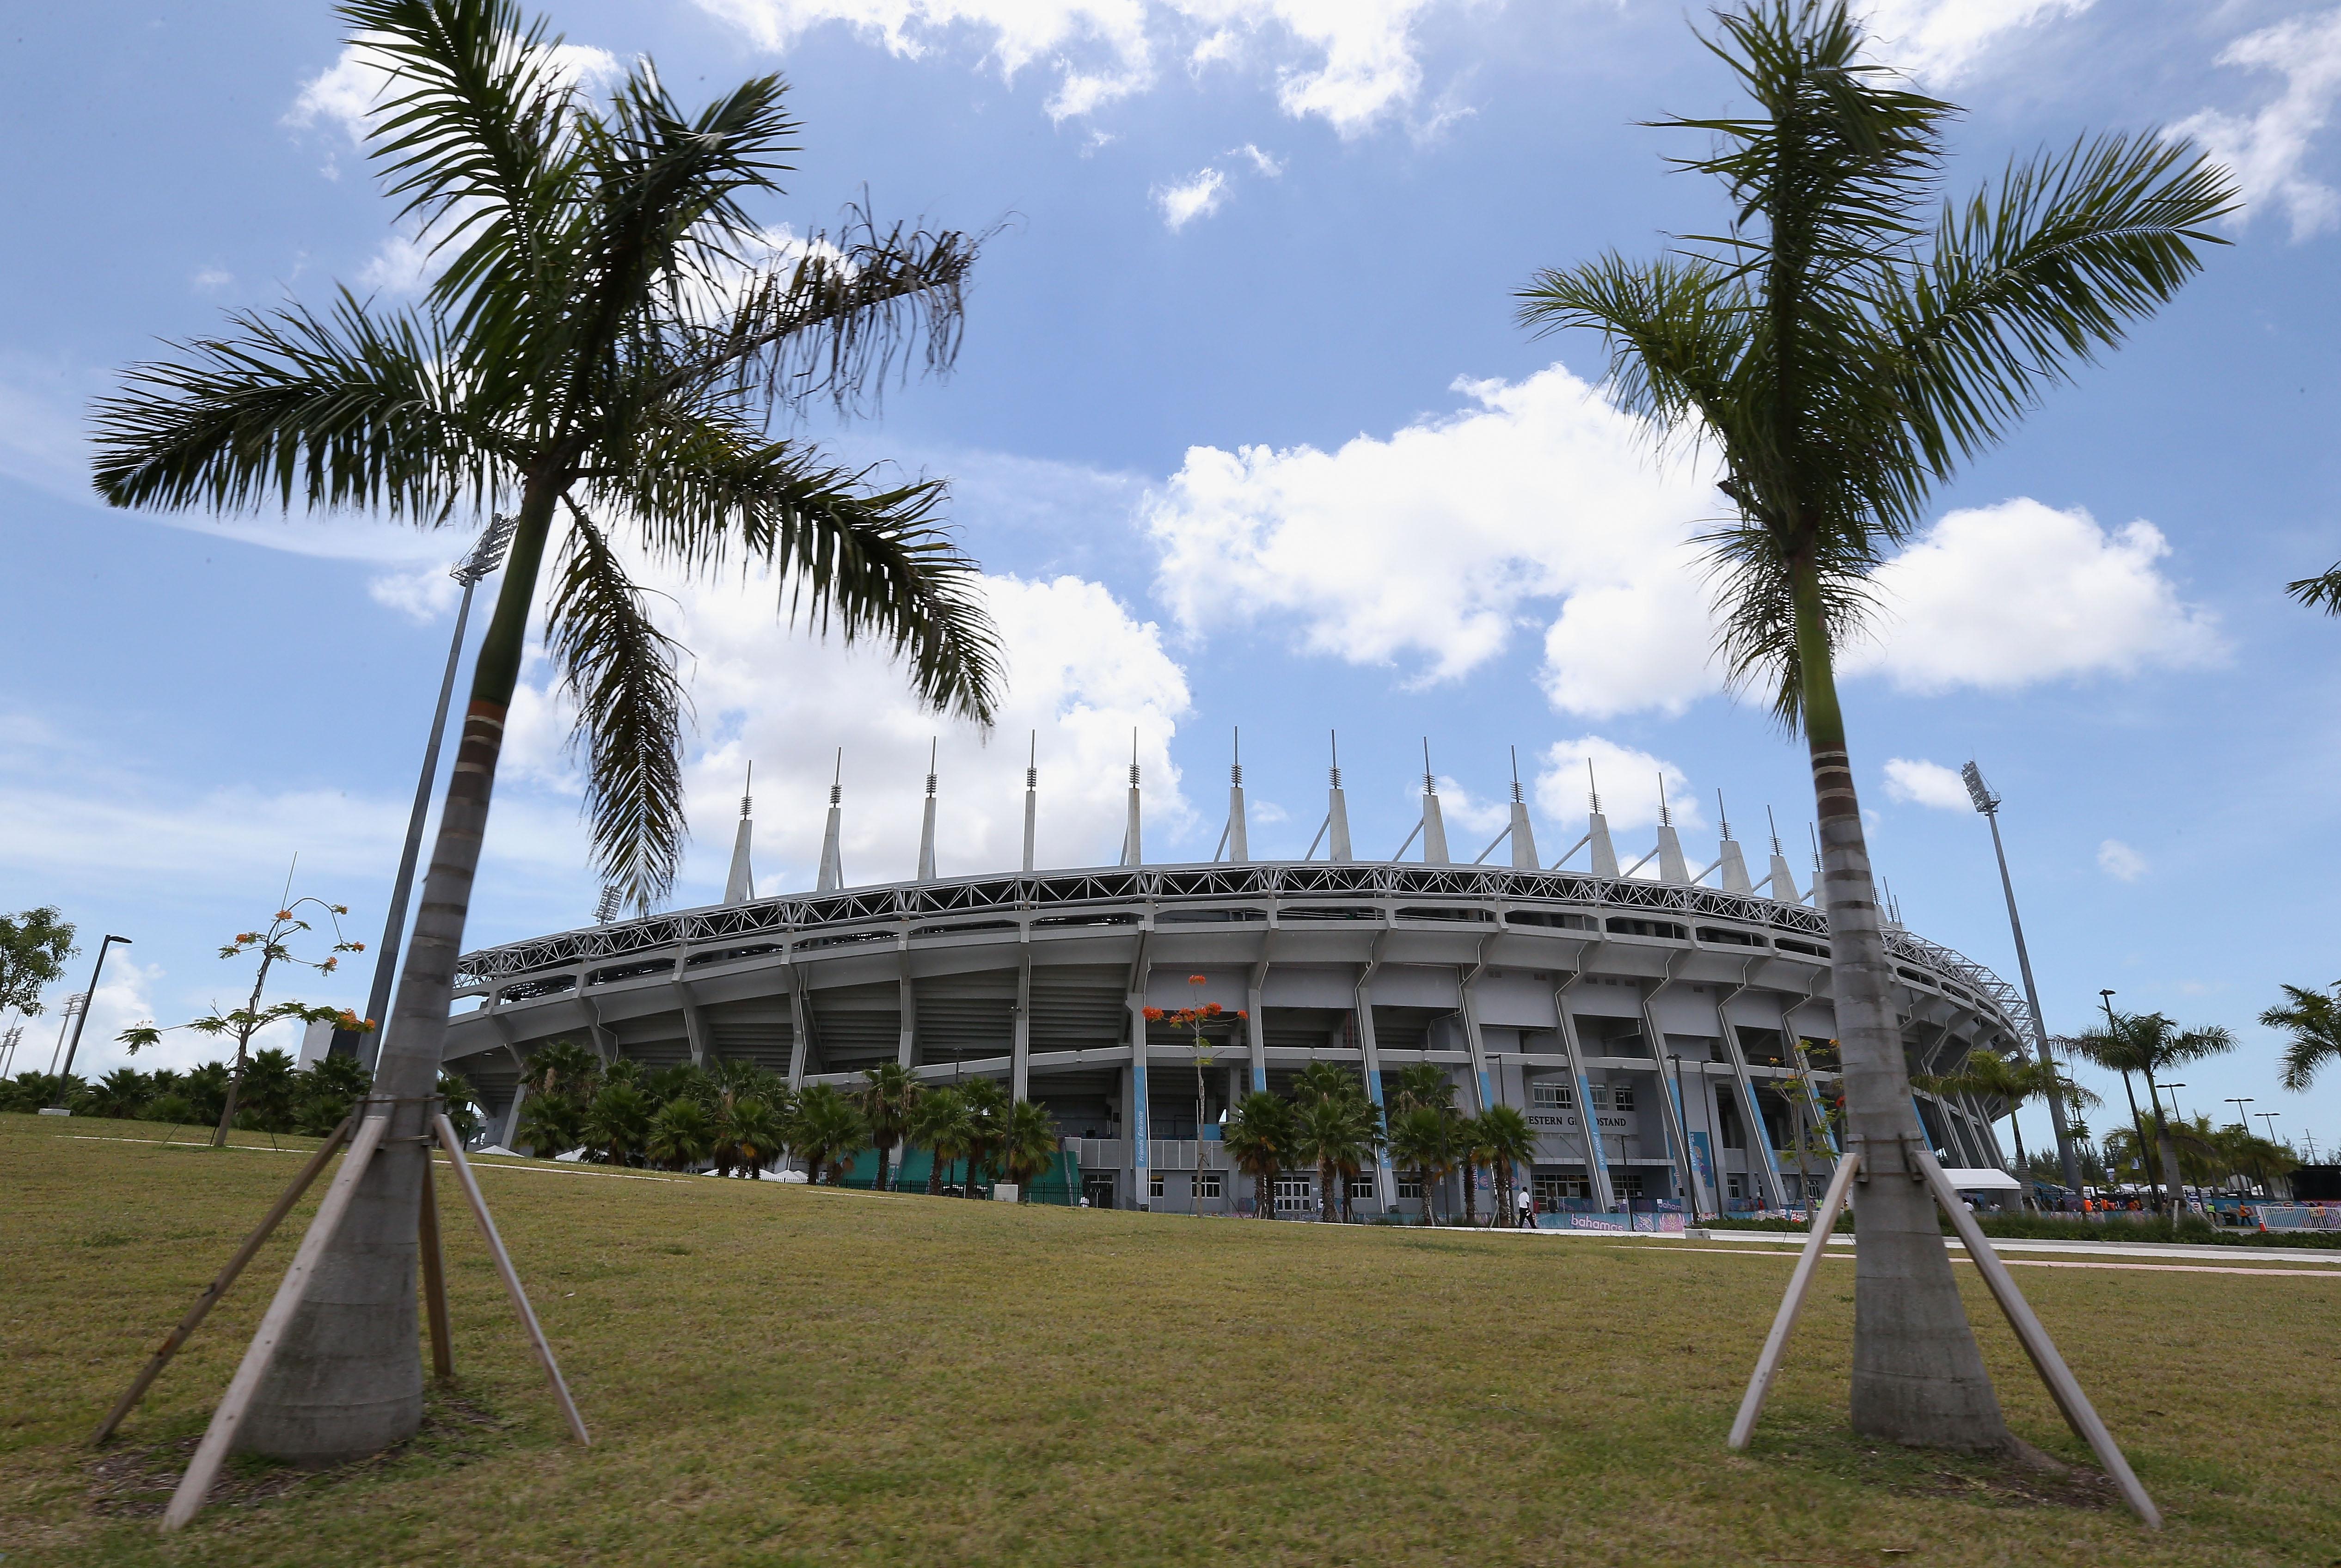 IAAF World Relays - Day 2